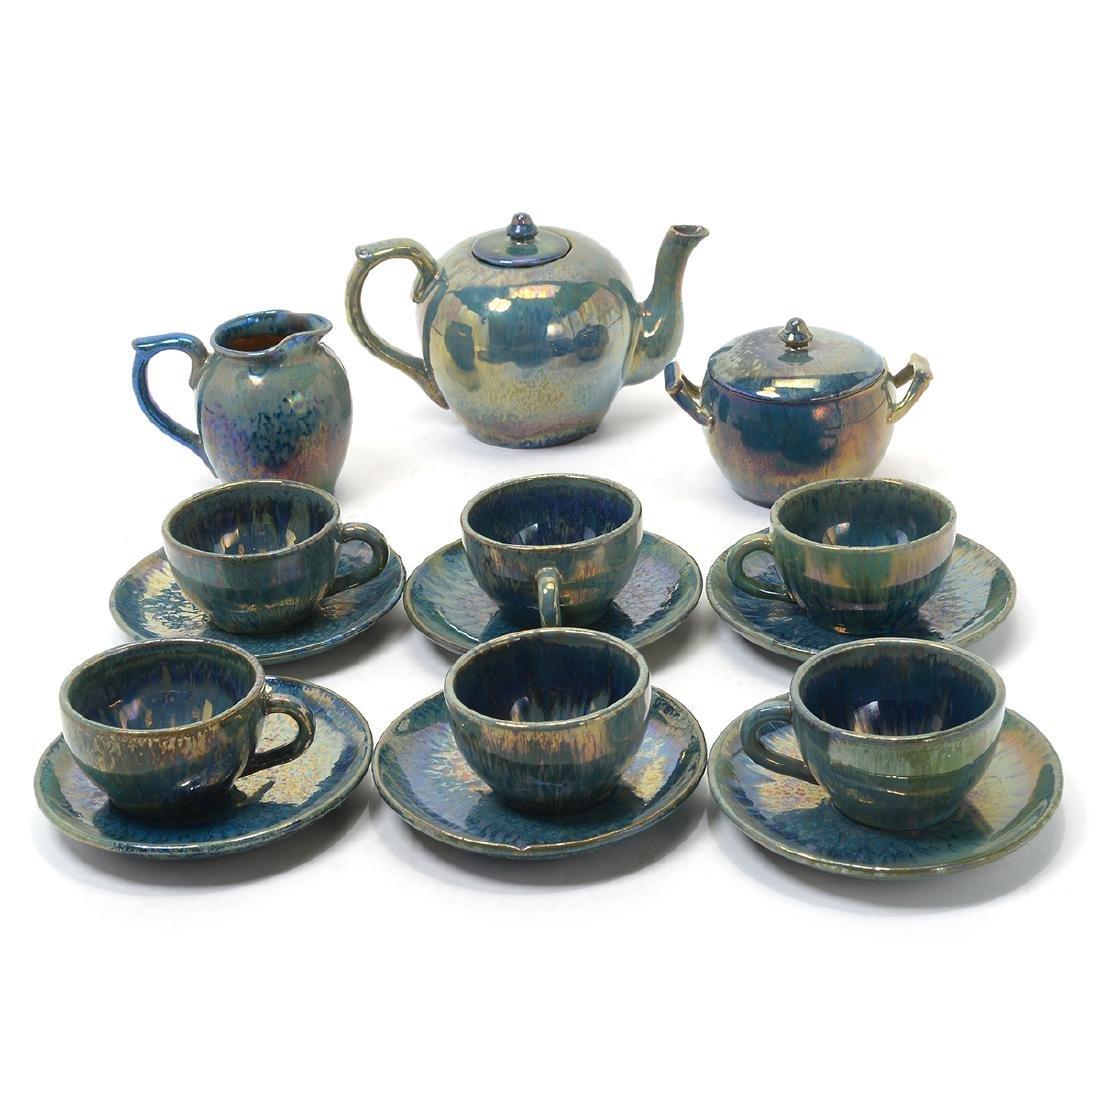 Alphonse Cytere Iridescent Art Pottery Tea Service